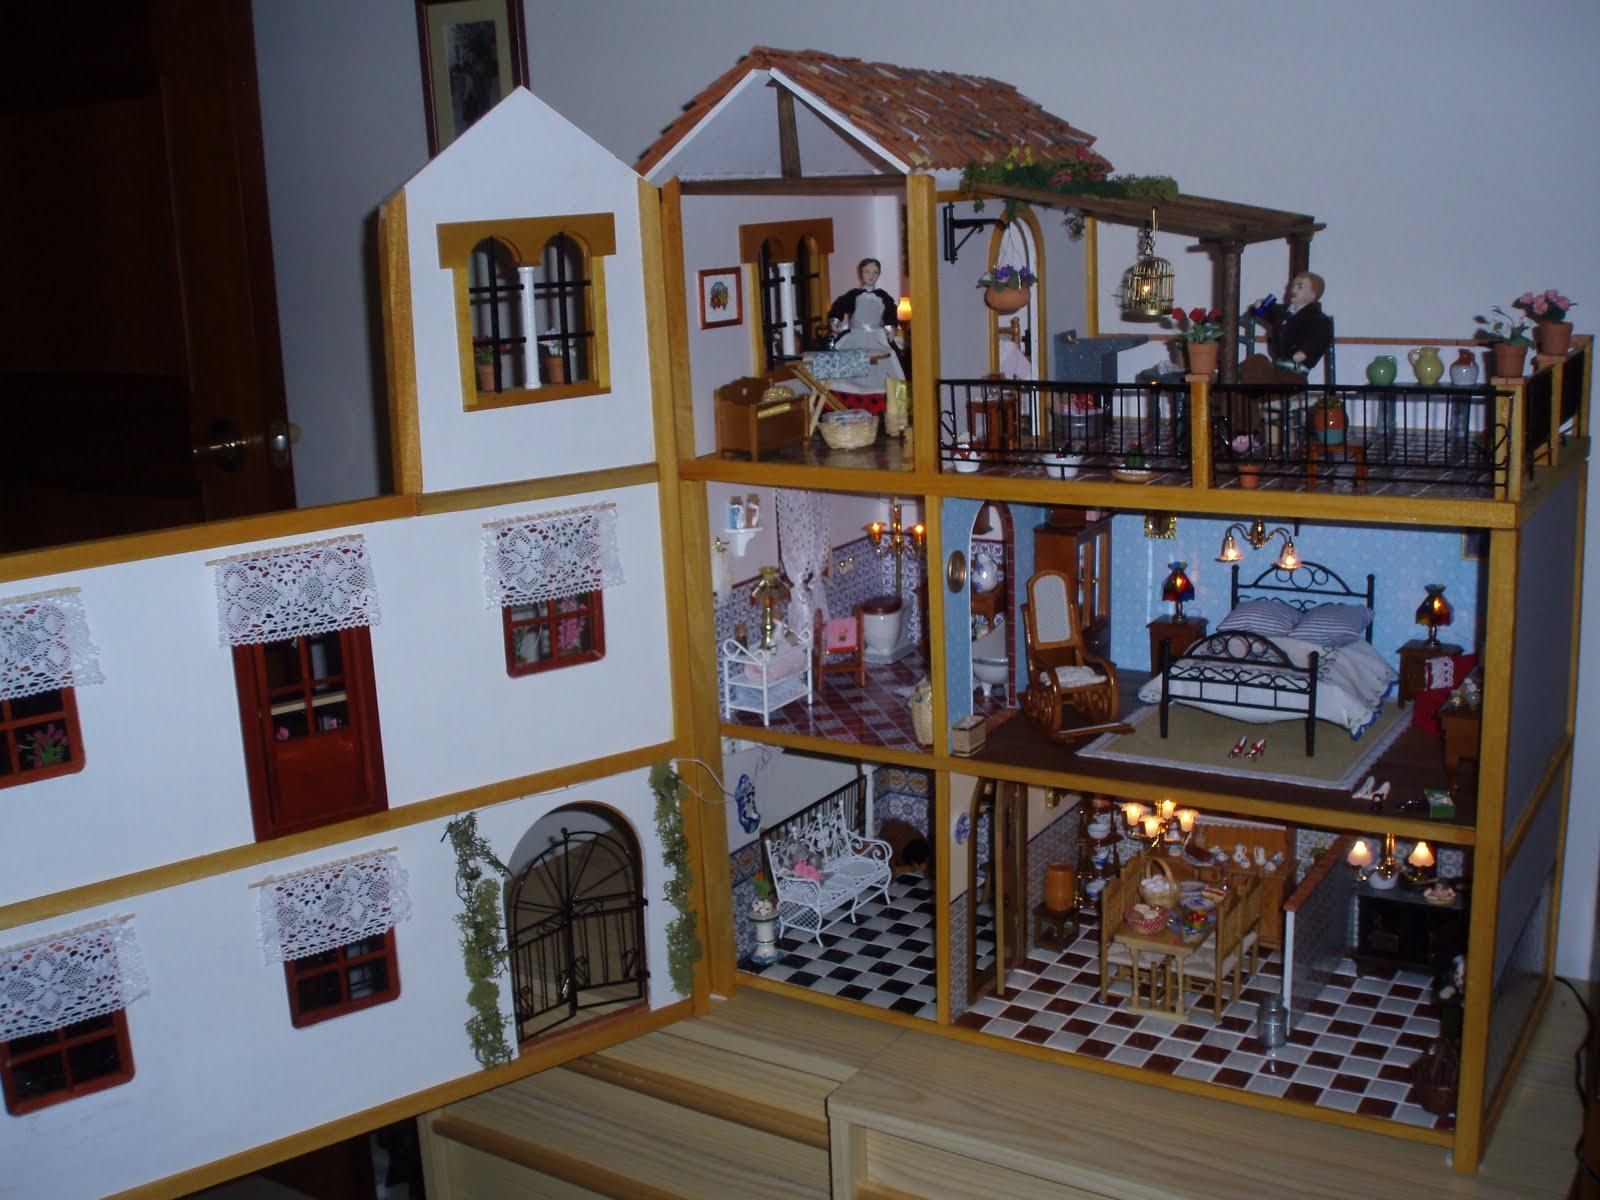 Lola y sus miniaturas casa andaluza villa triana for Casa andaluza